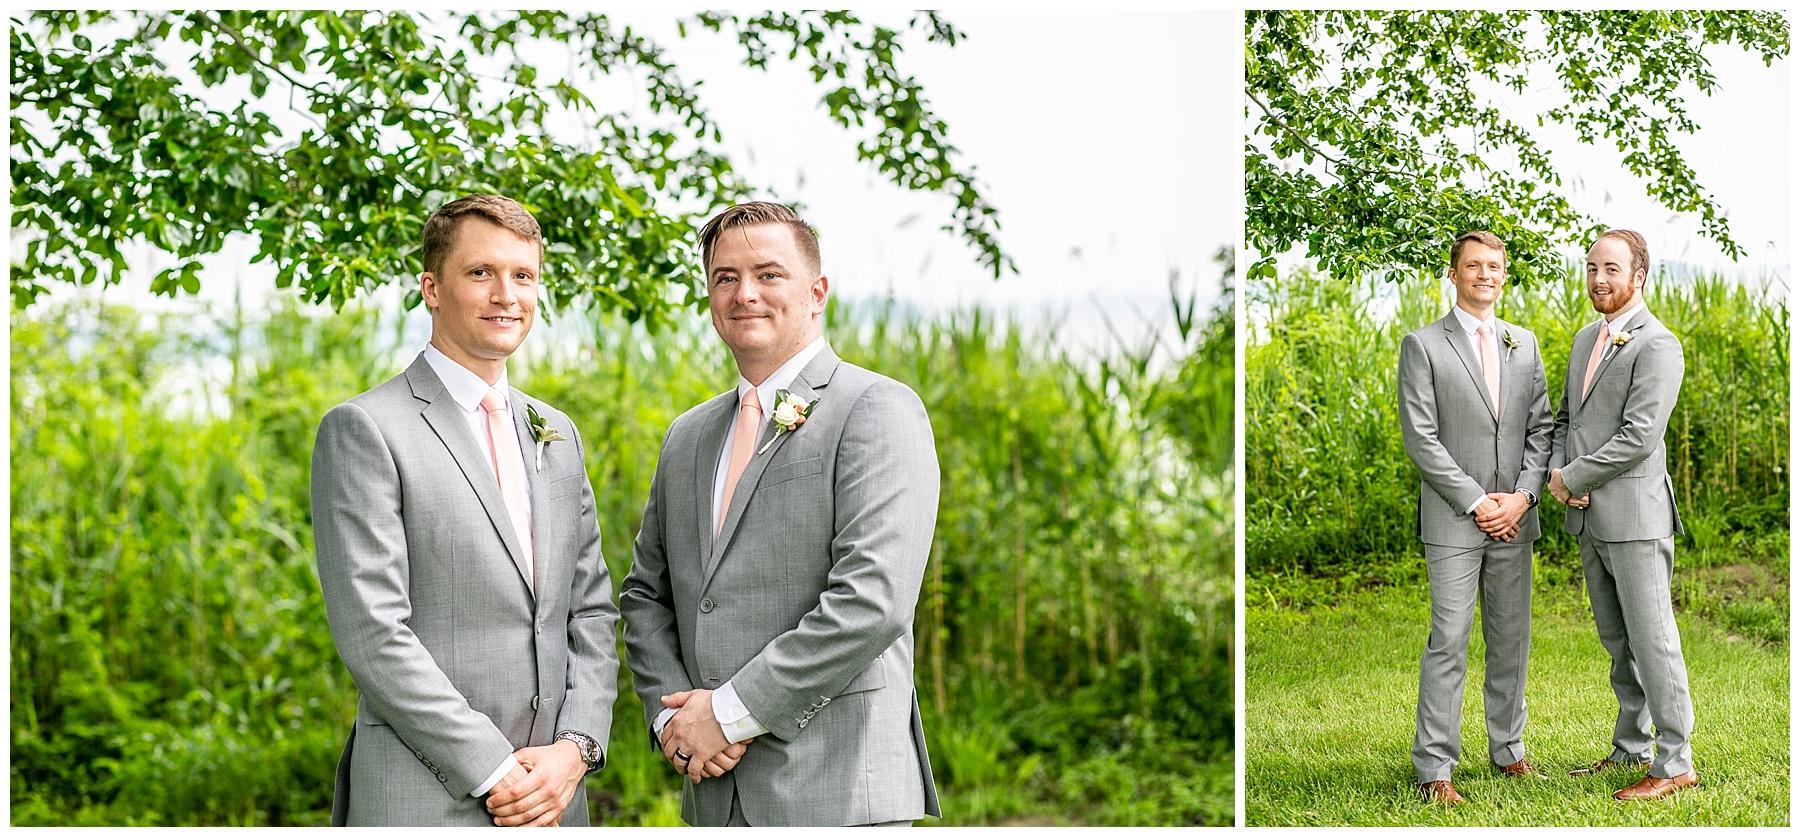 Chelsea Phil Bohemia River Overlook Wedding Living Radiant Photography photos_0072.jpg